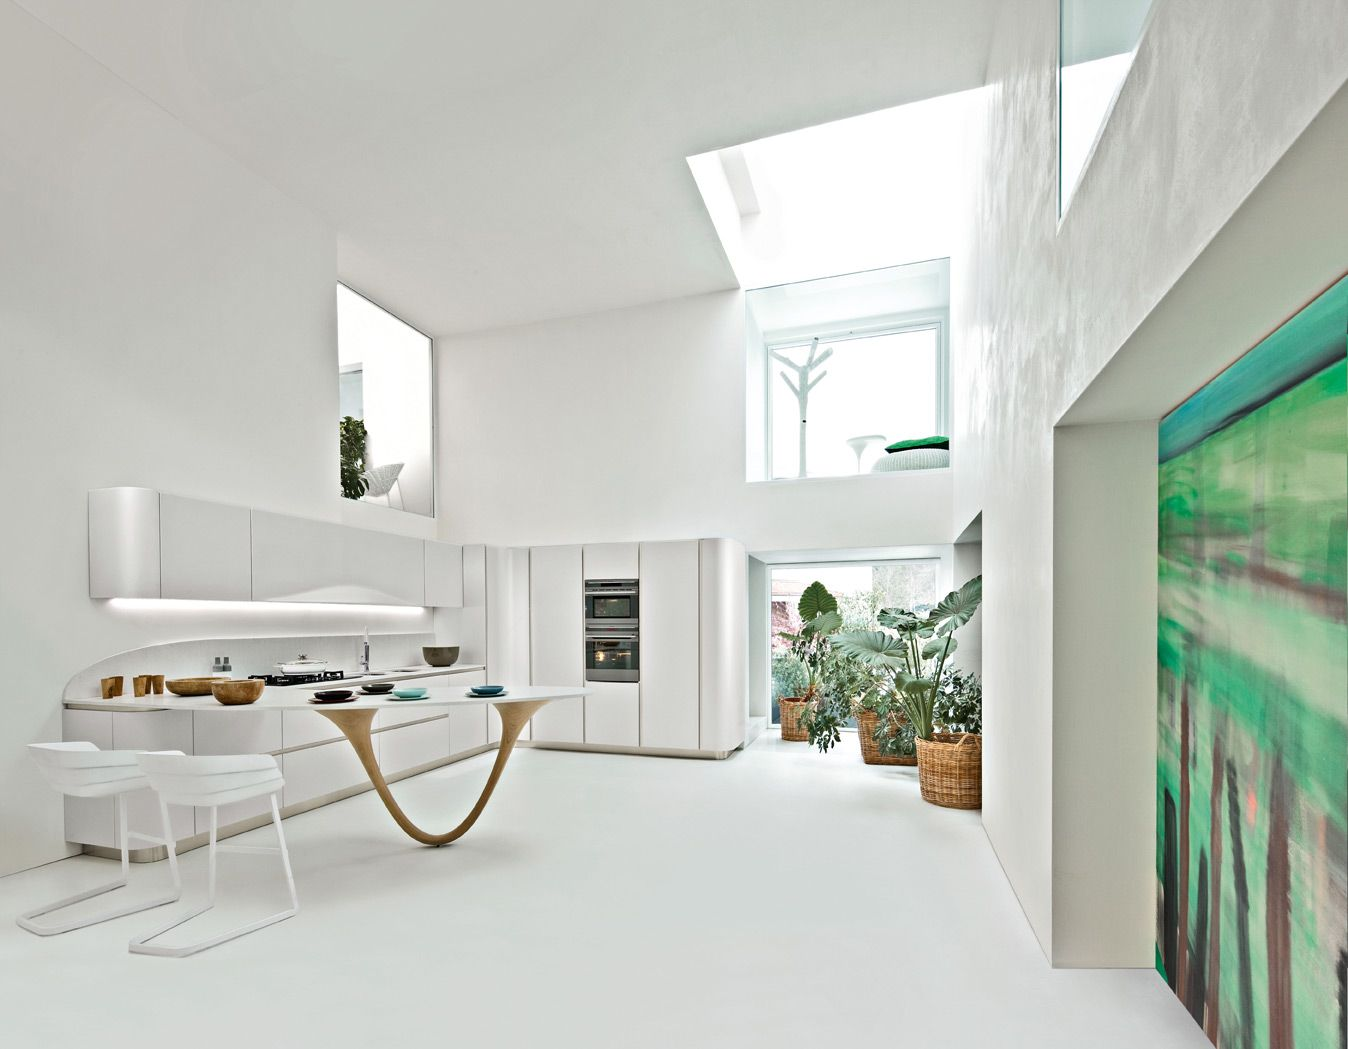 Ola 20 pininfarina design doors in nordic white for Decorazioni cucine moderne